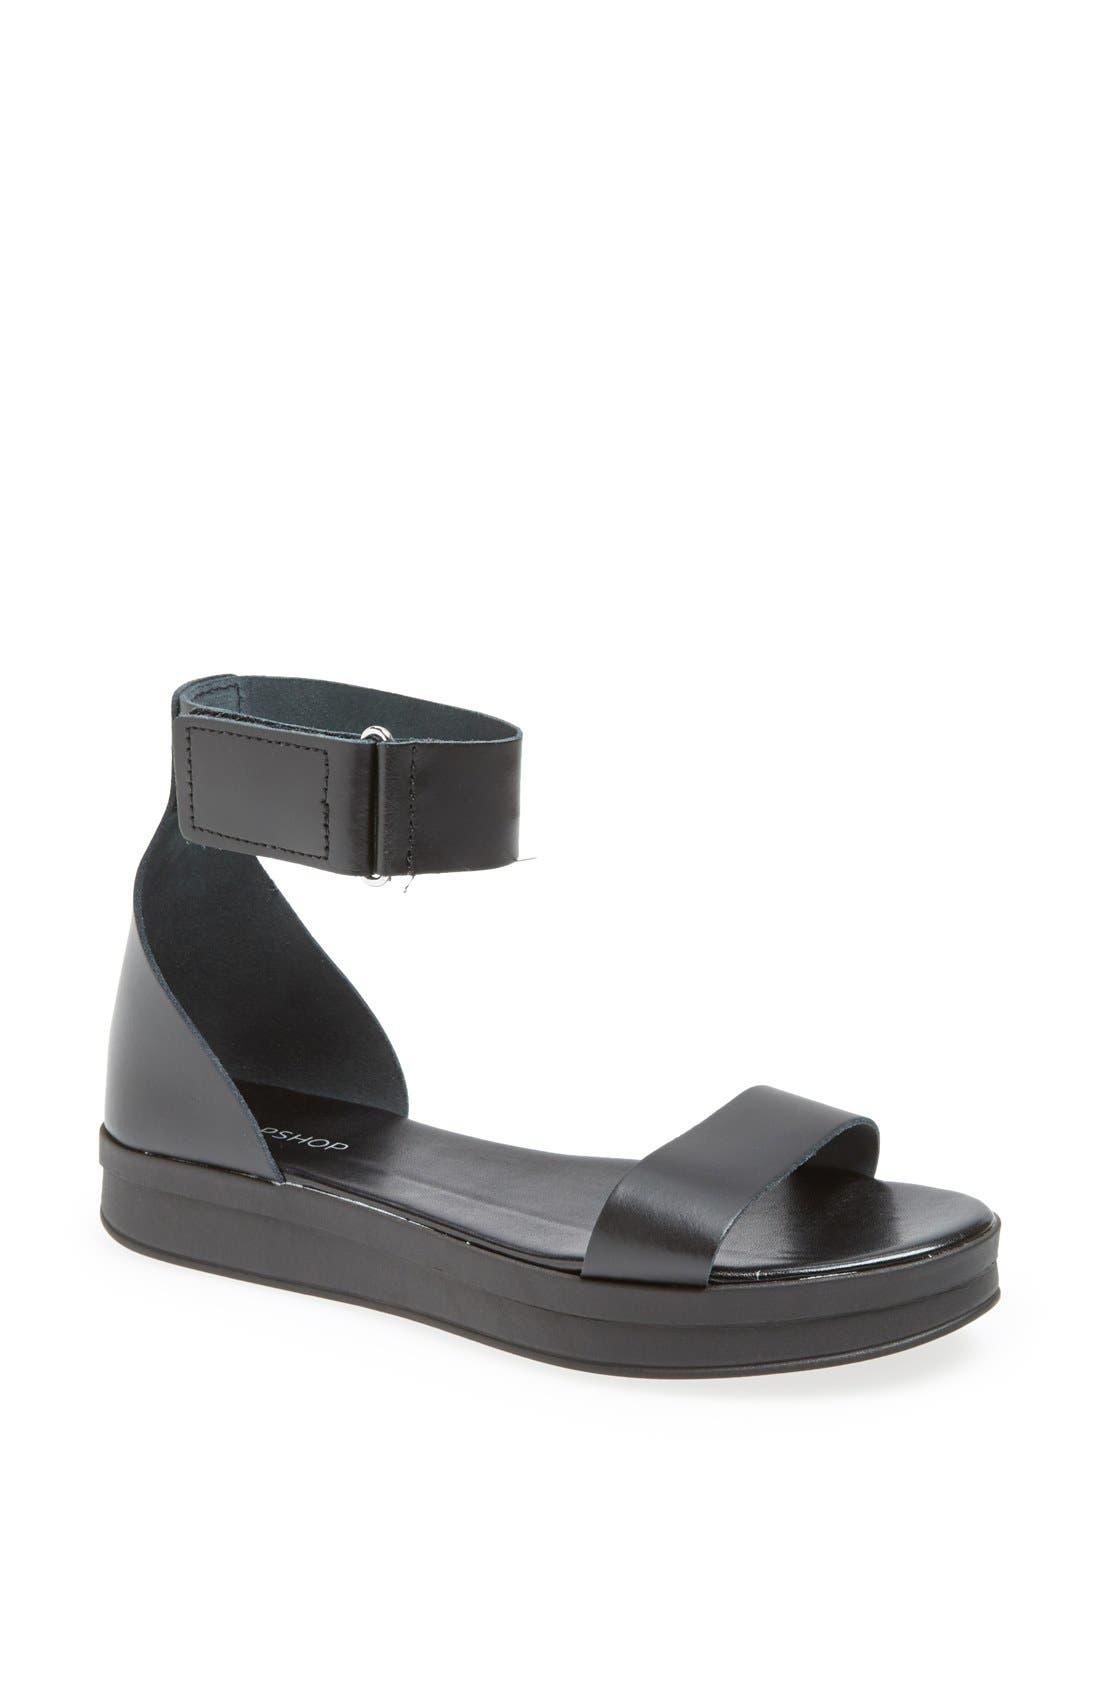 Main Image - Topshop 'Harper' Sandal